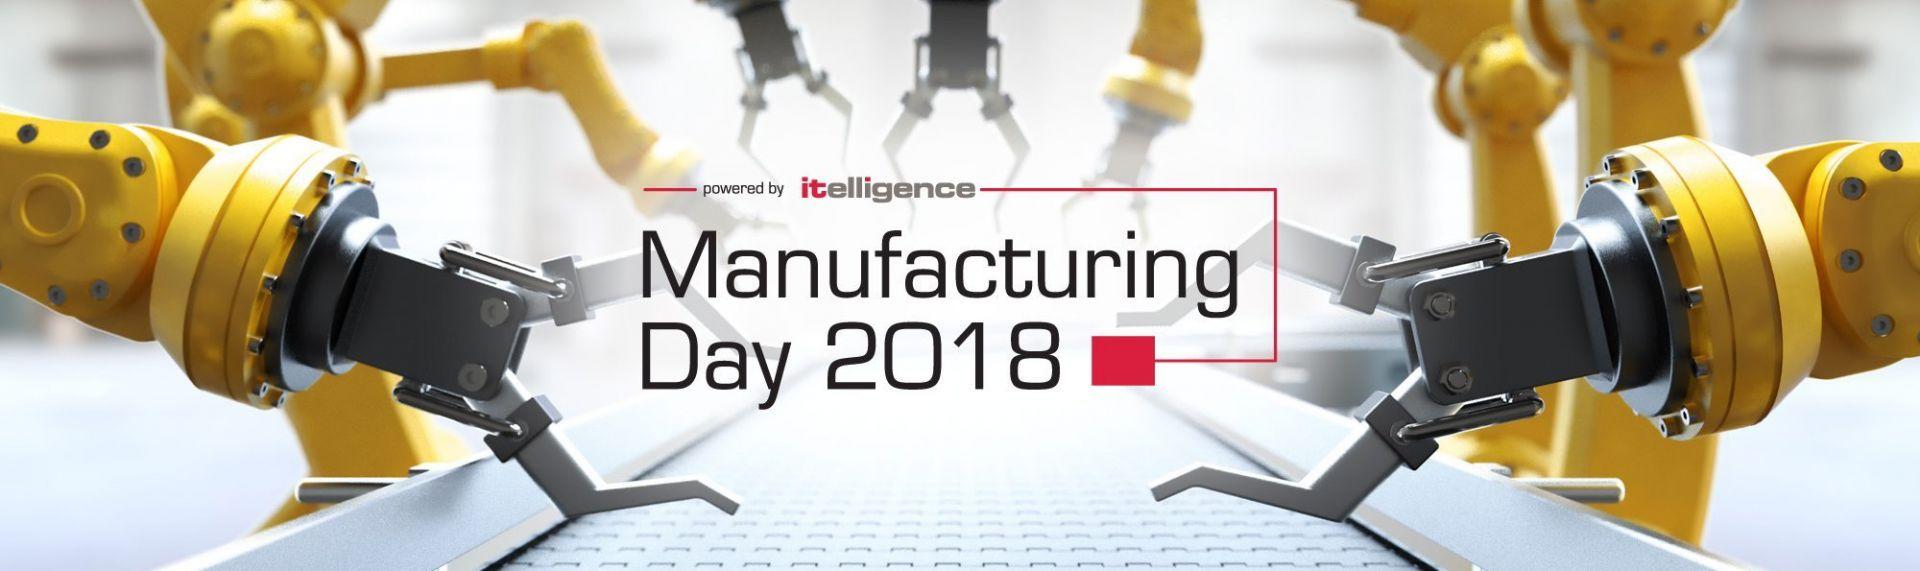 Relacja z konferencji Manufacturing Day 2018